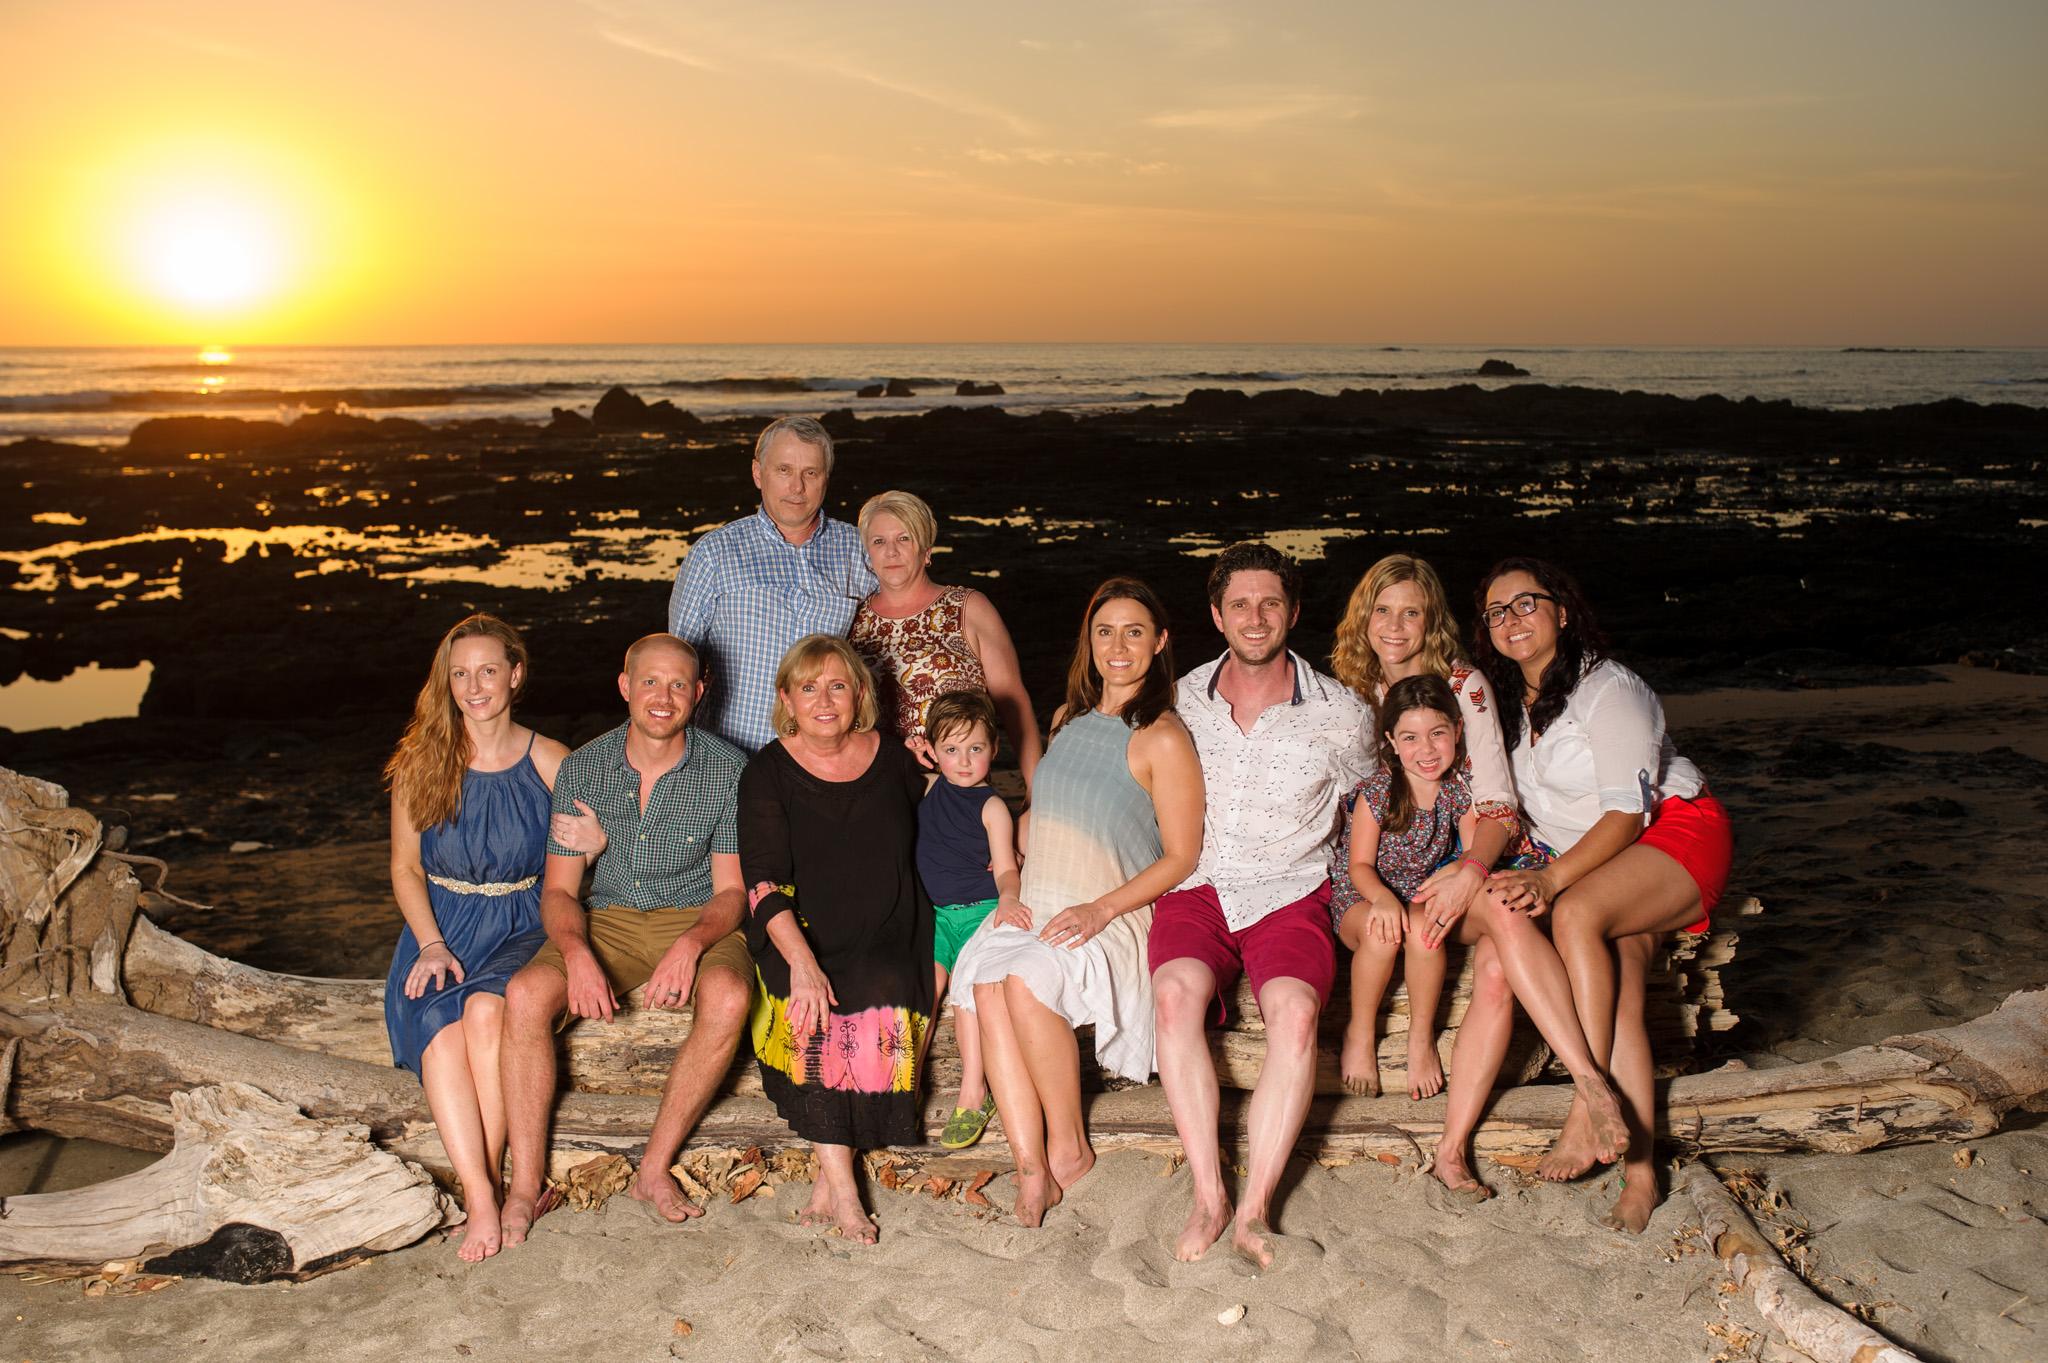 Family reunion photoshoot  at Junquillal